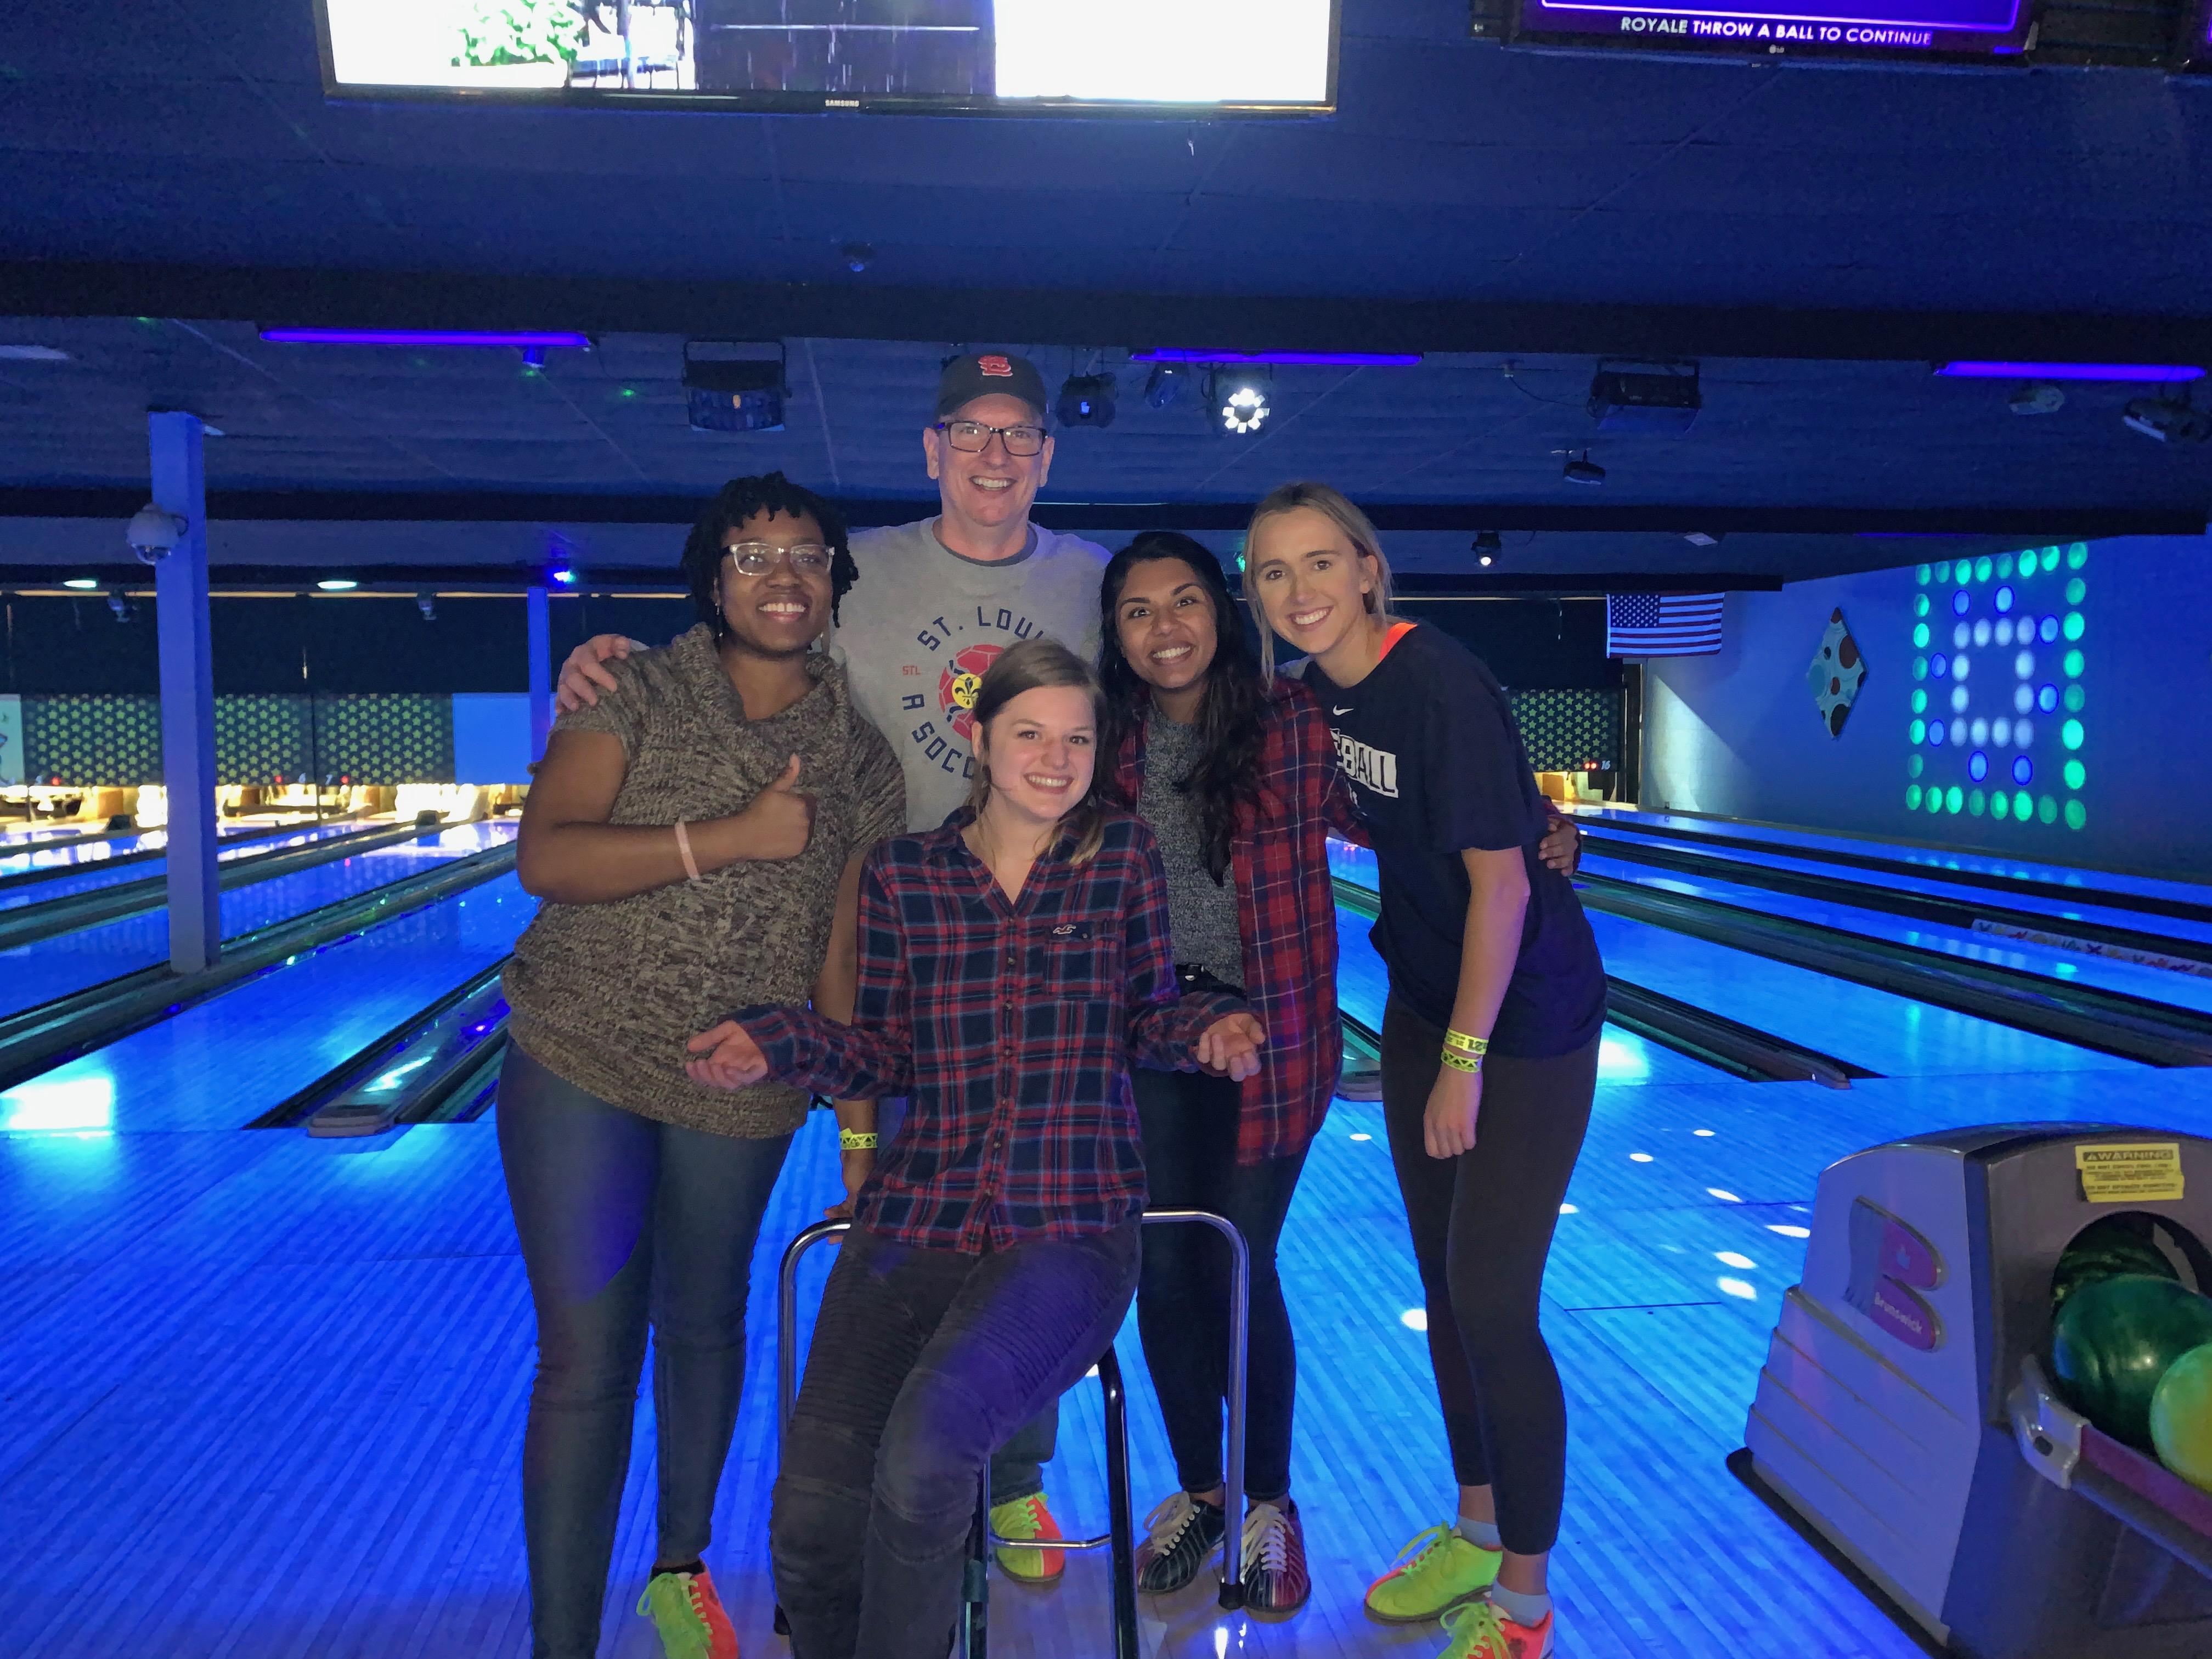 Bowling Team Photo